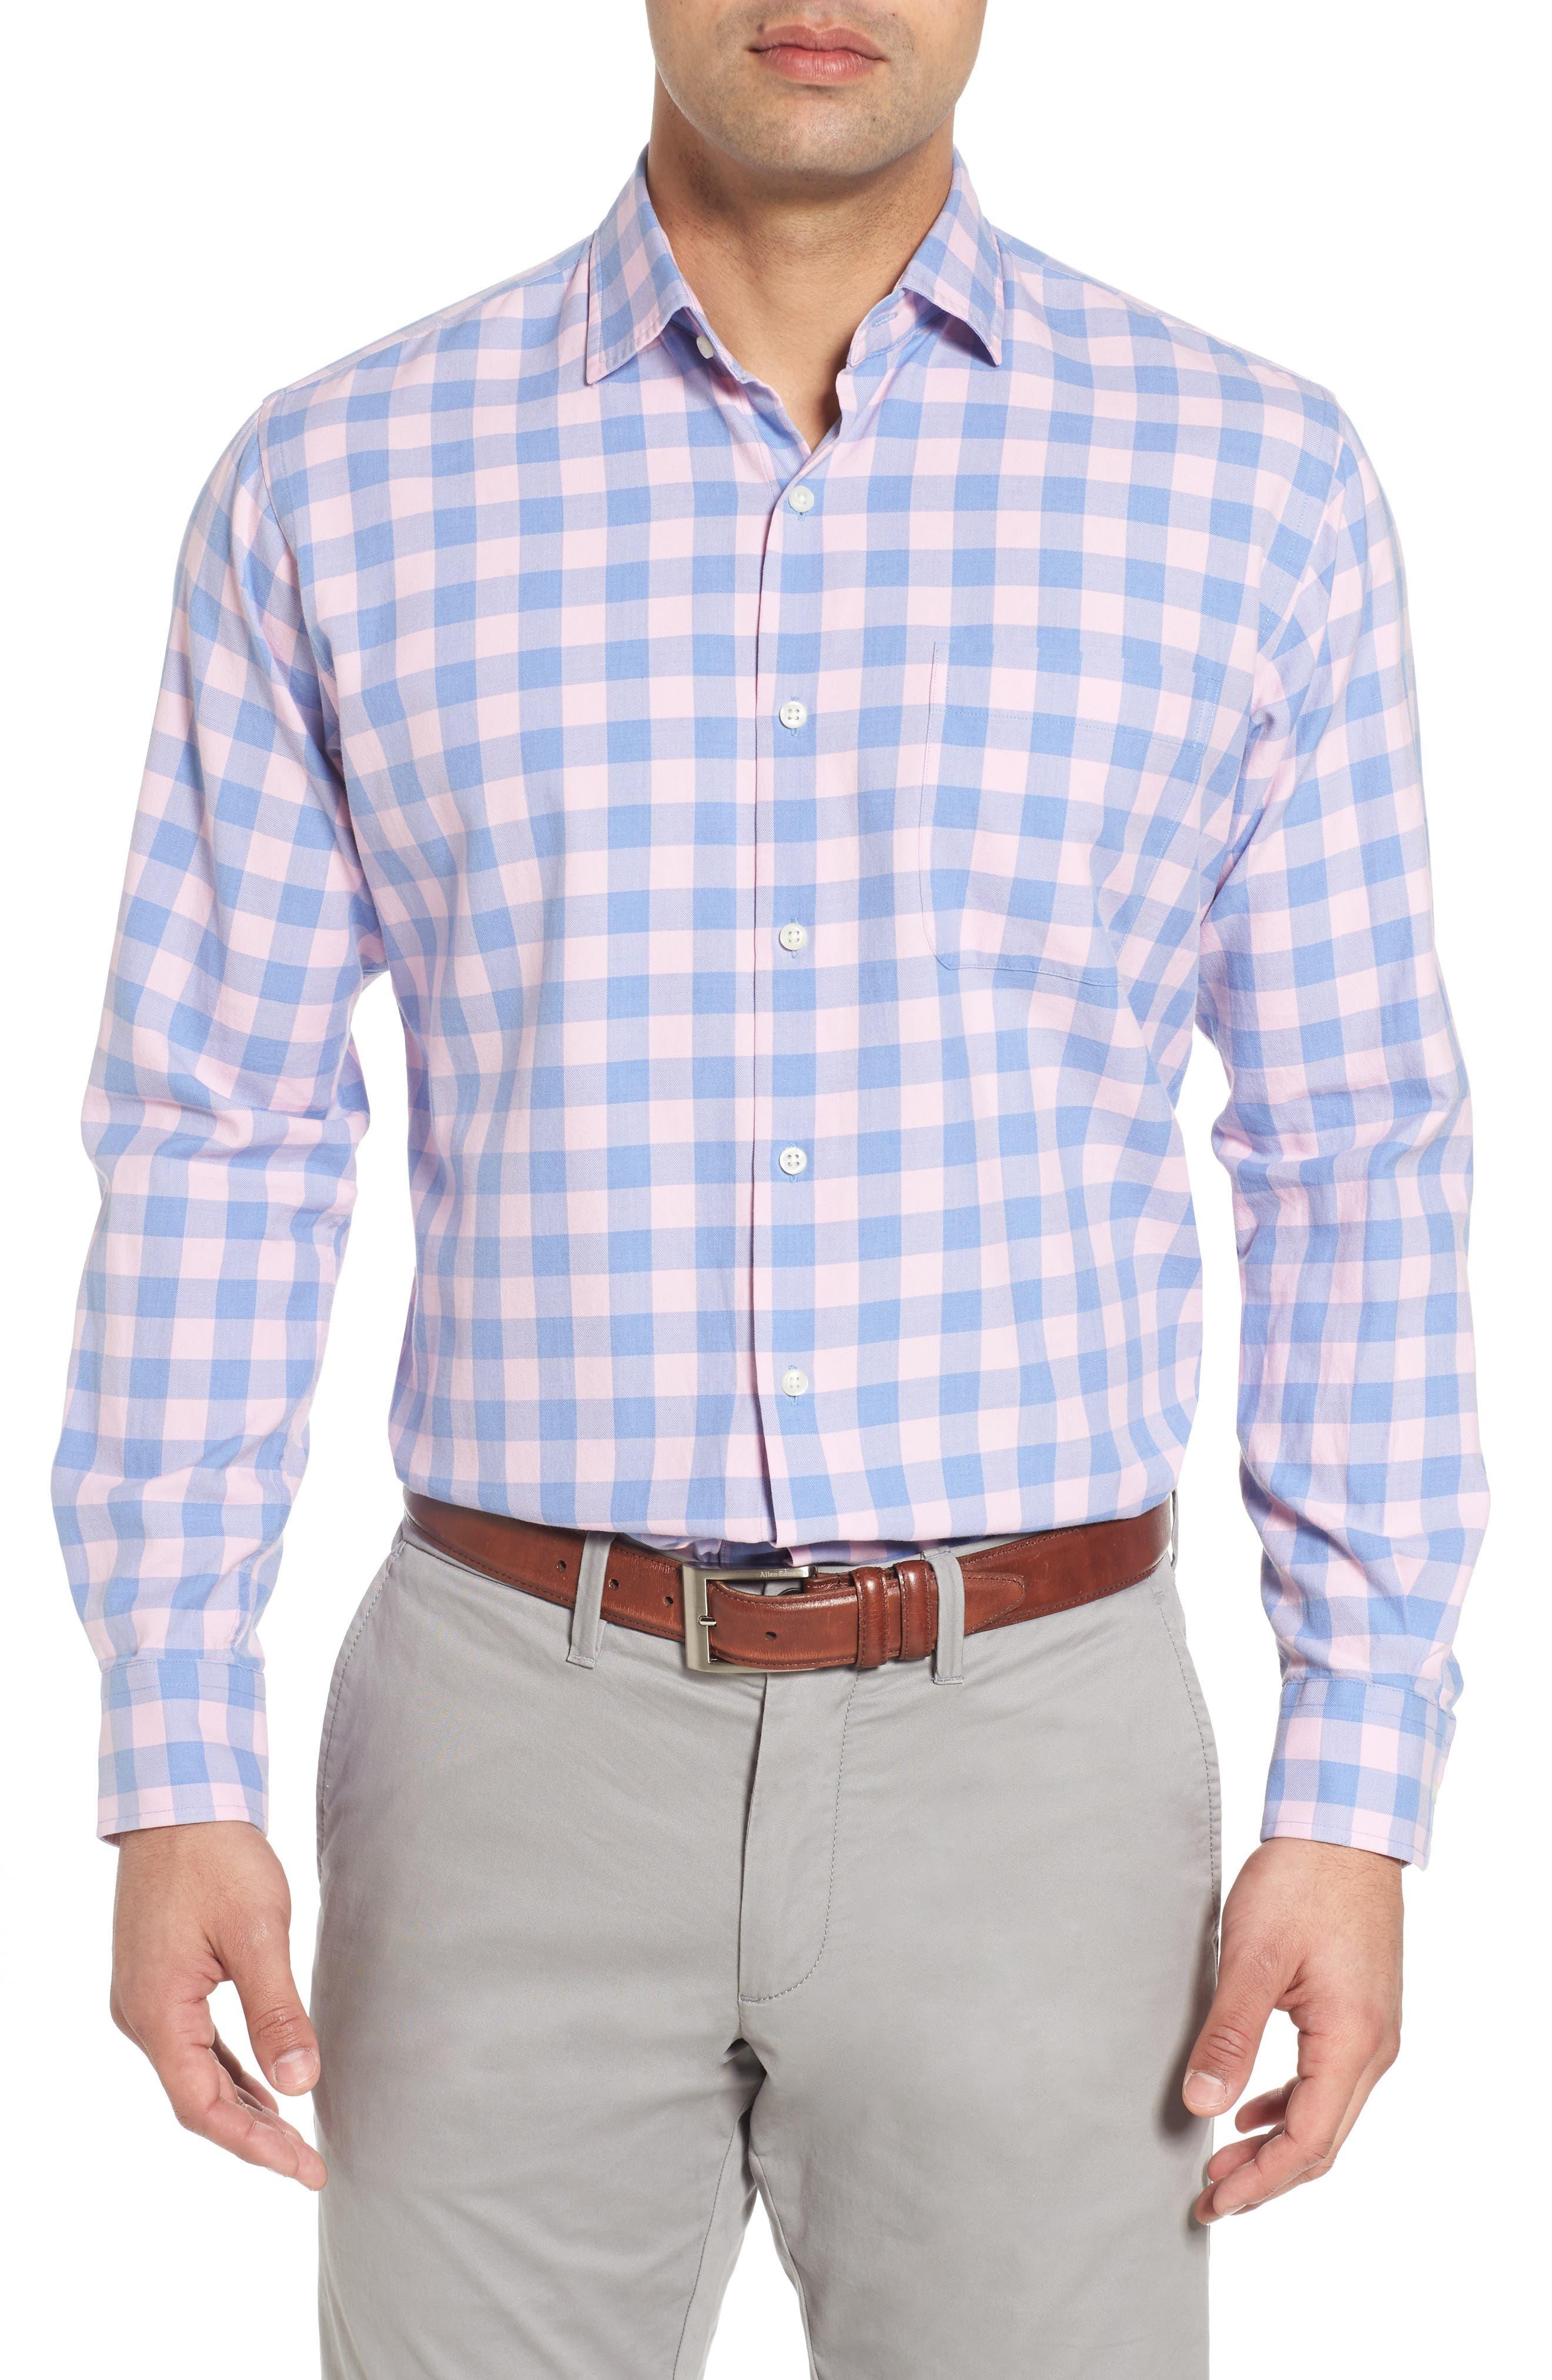 Seaglass Gingham Check Sport Shirt,                             Main thumbnail 1, color,                             Bonnet